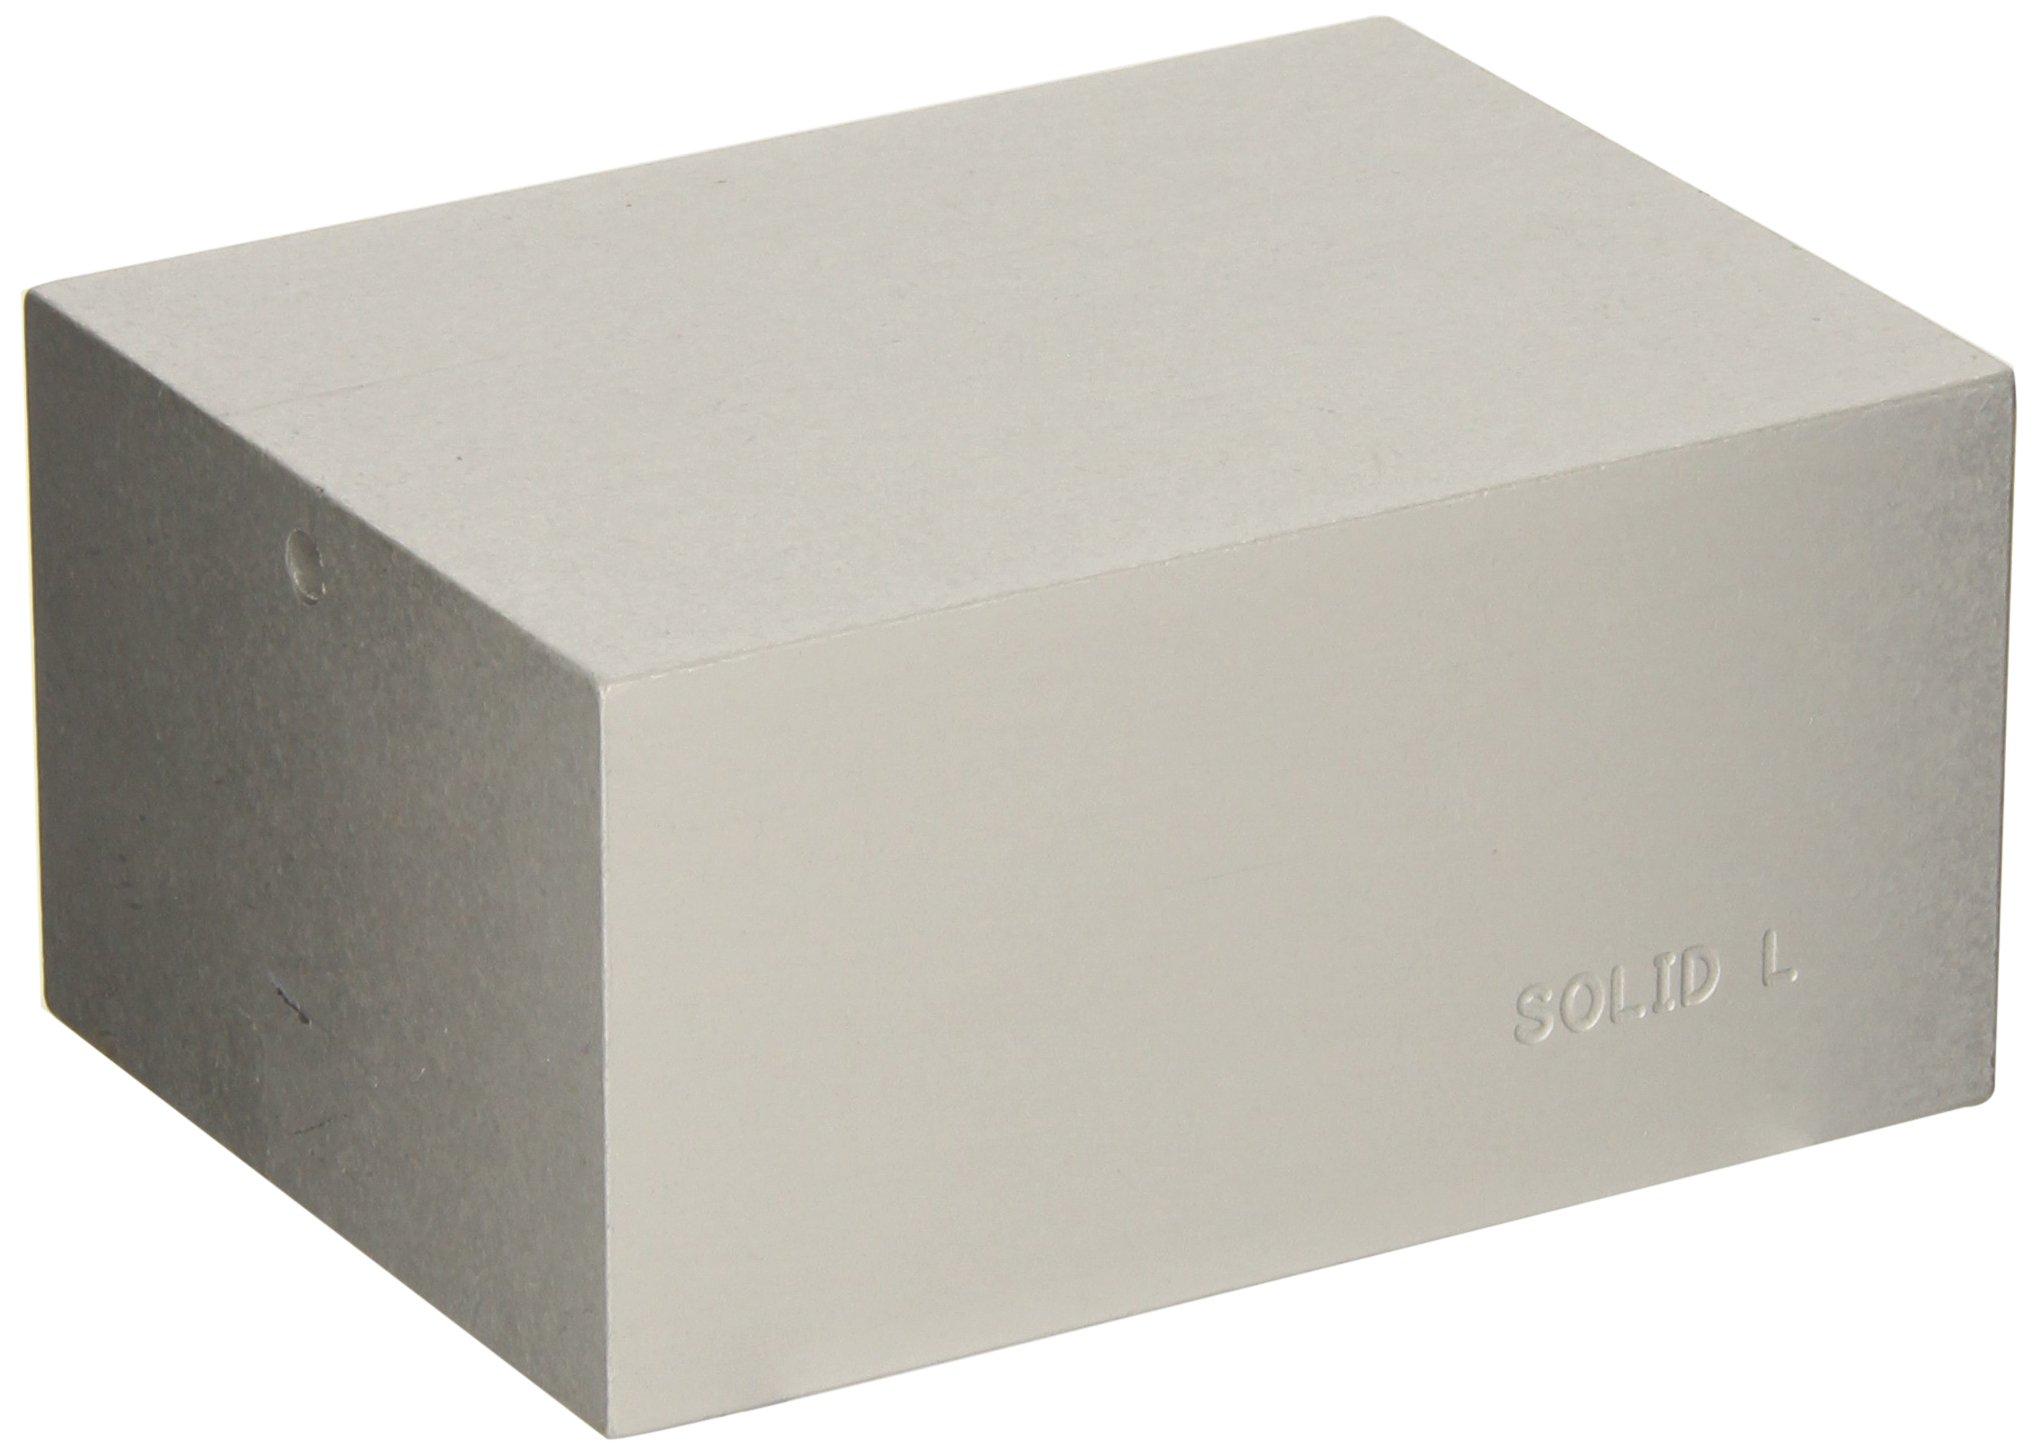 Barnstead Solid Aluminum Modular Block by Barnstead